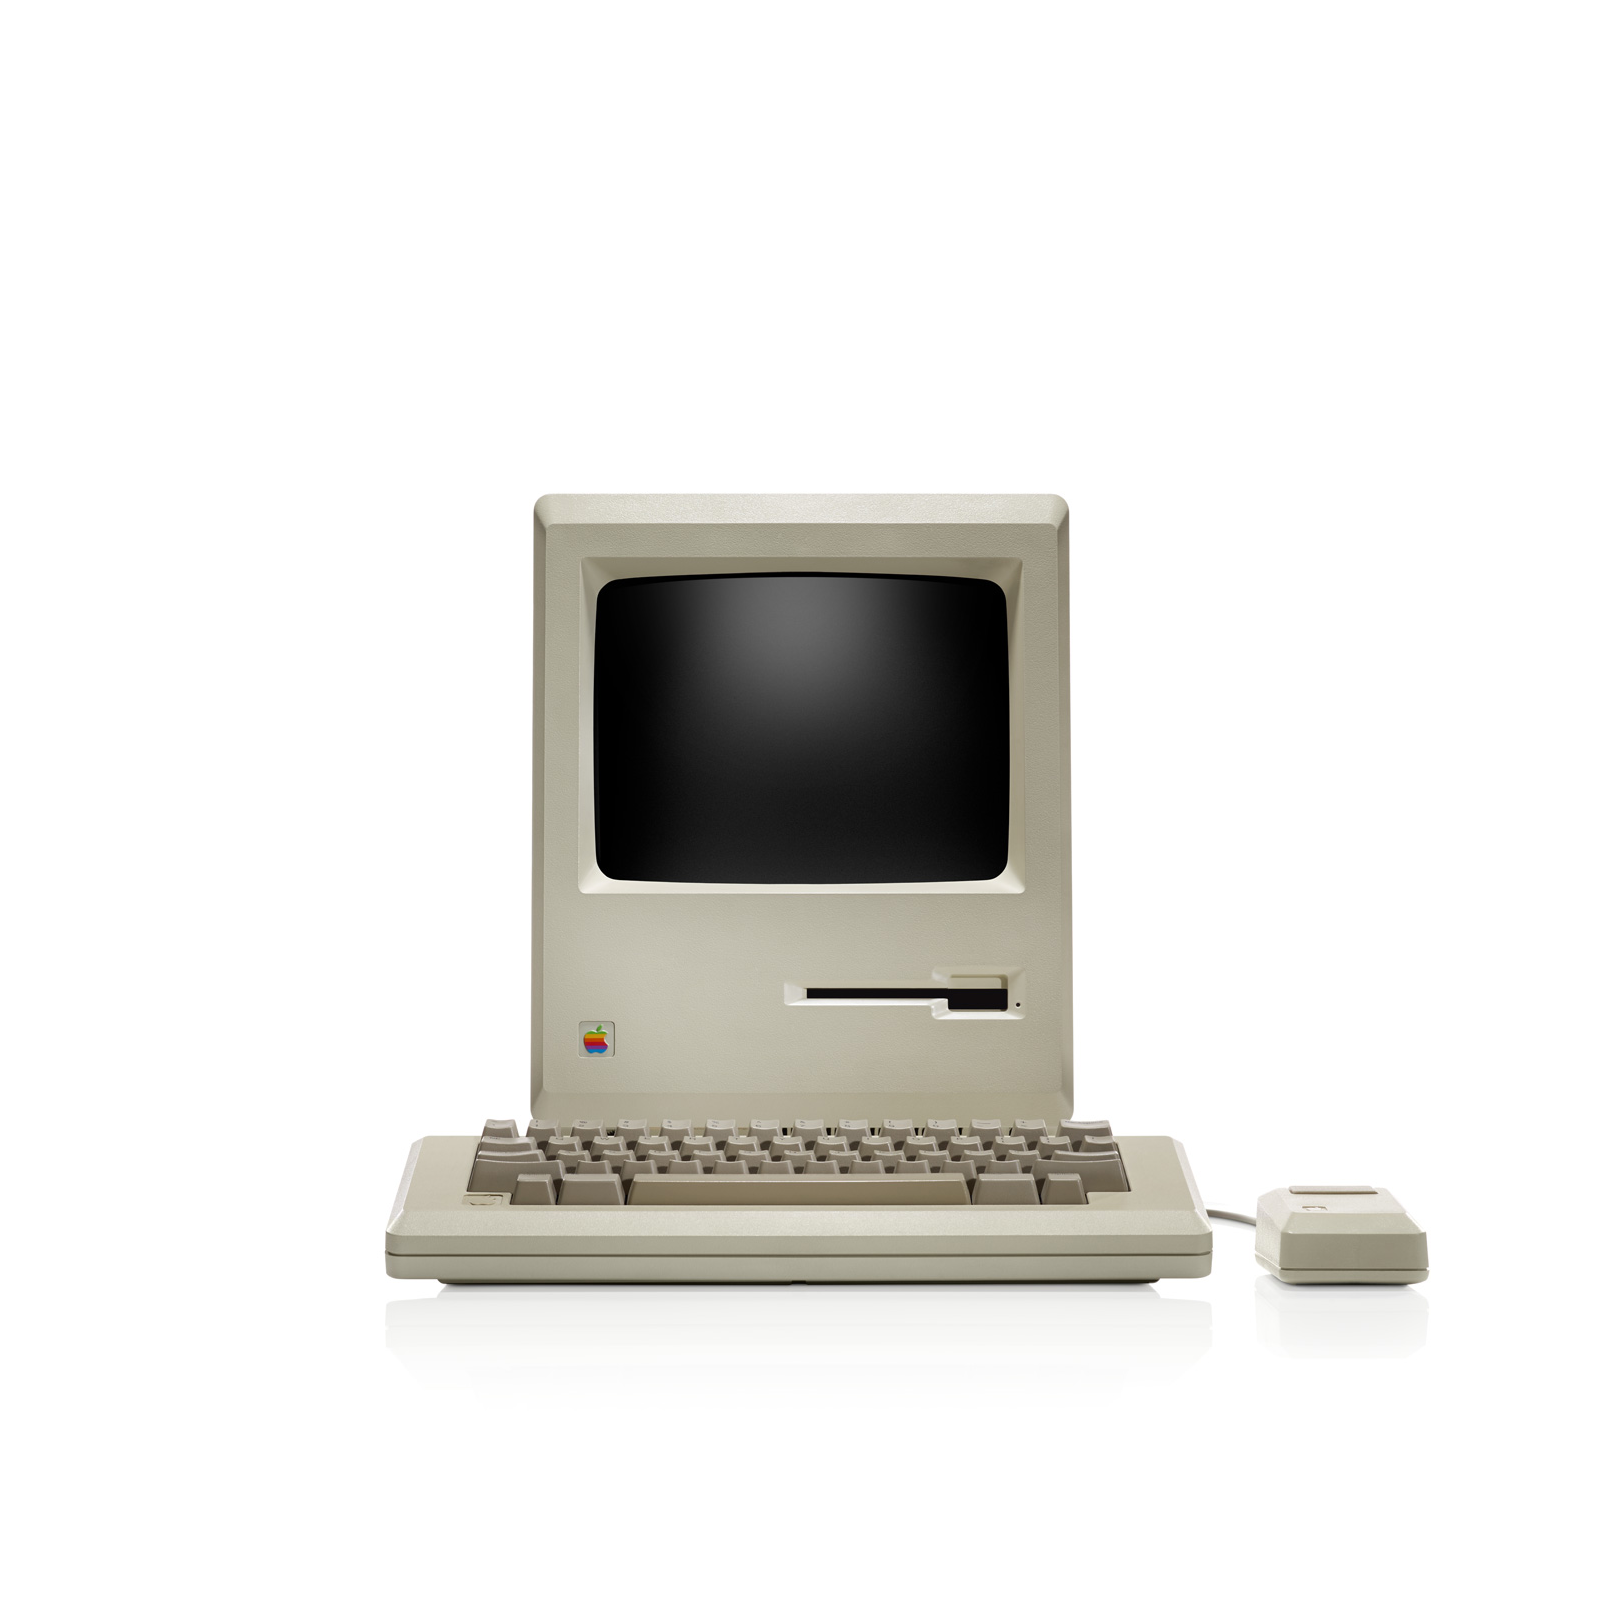 Apple - Thirty Years of Mac - 1984/ Macintosh